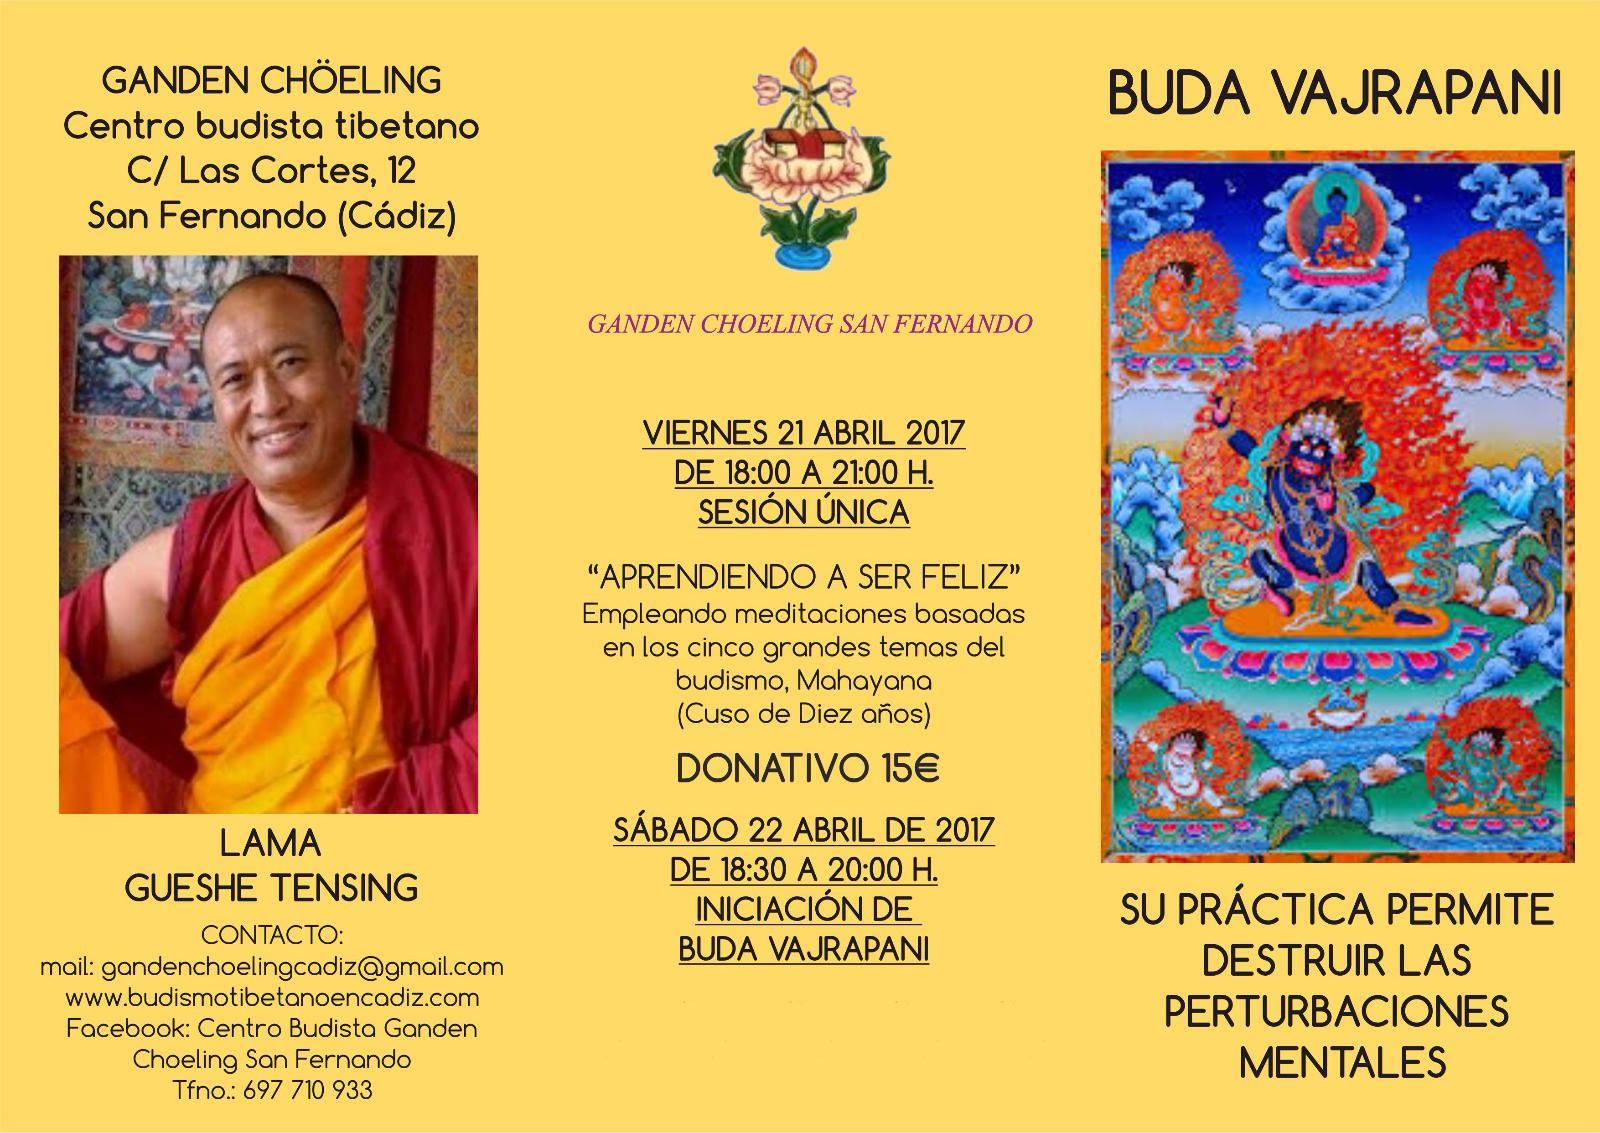 Event - 21-22 Apr 2017